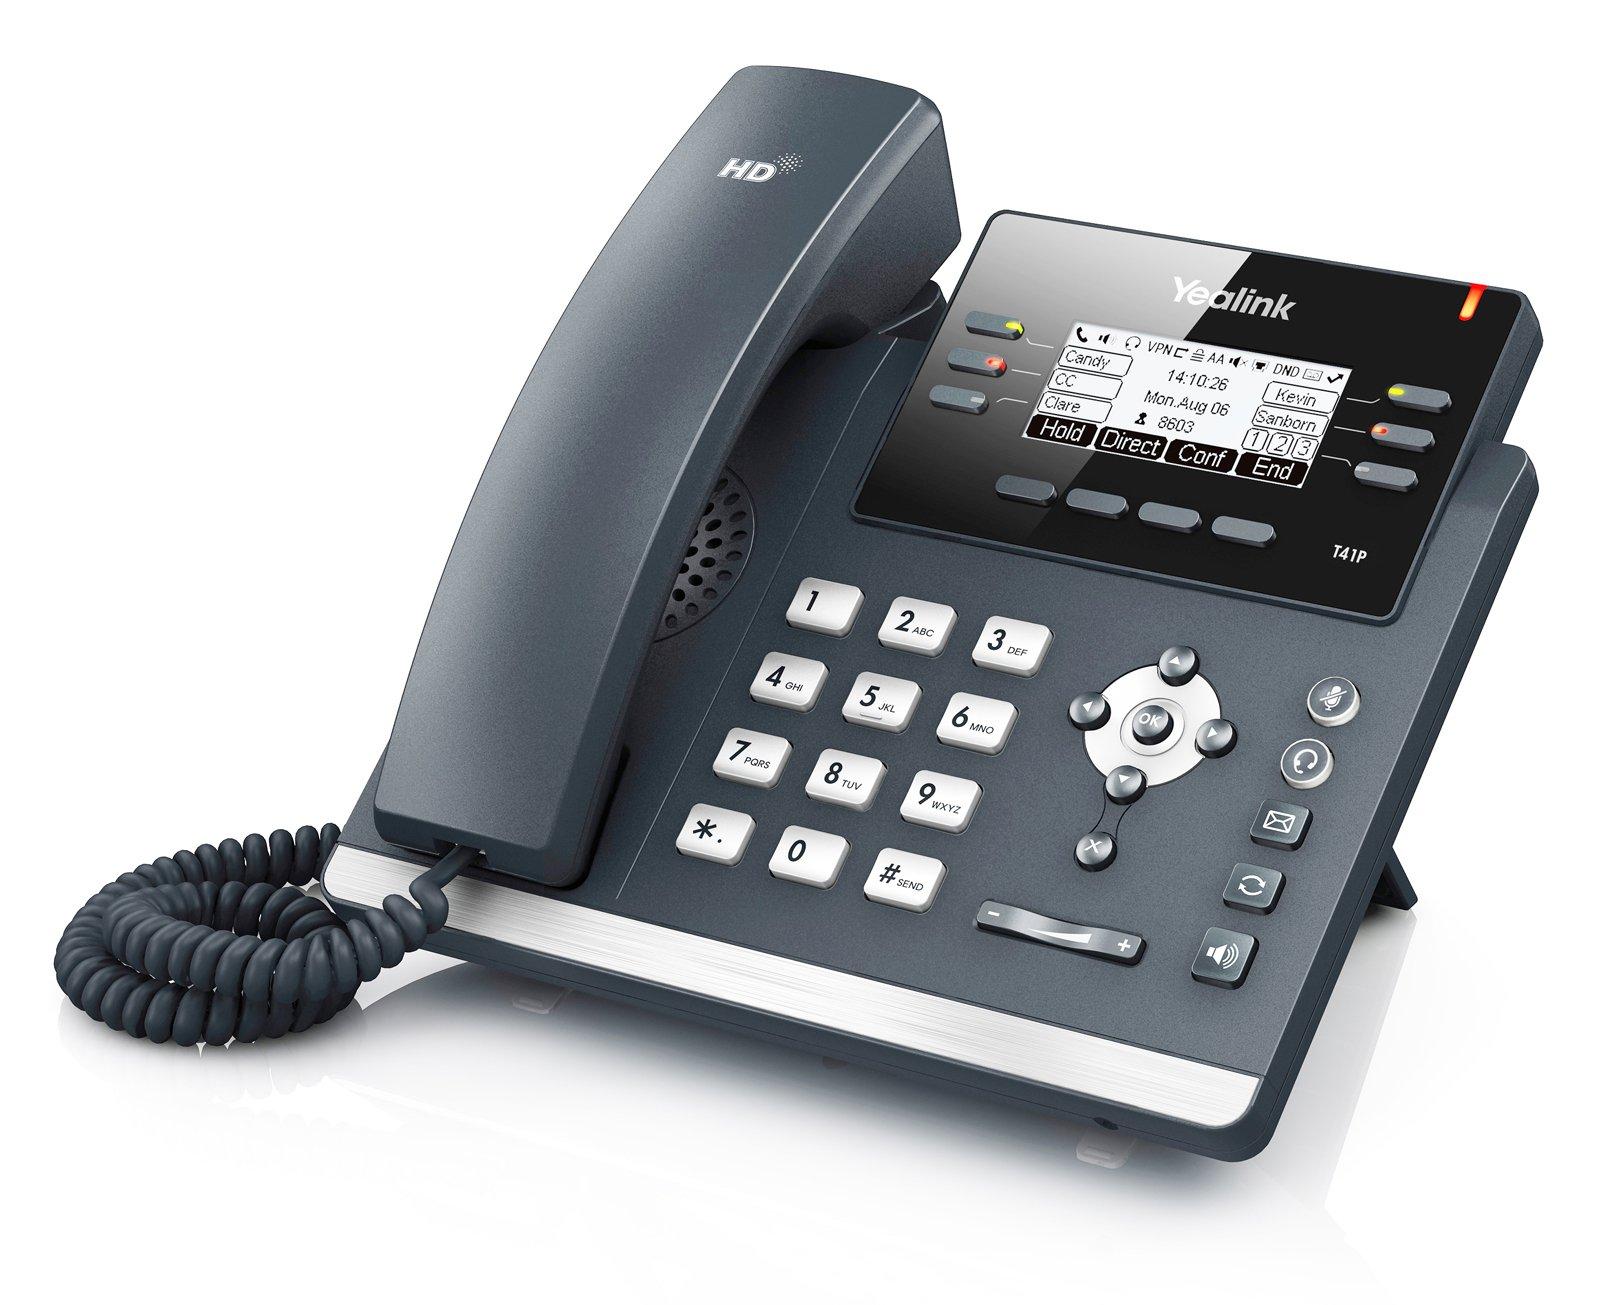 Yealink T41 IP Phone